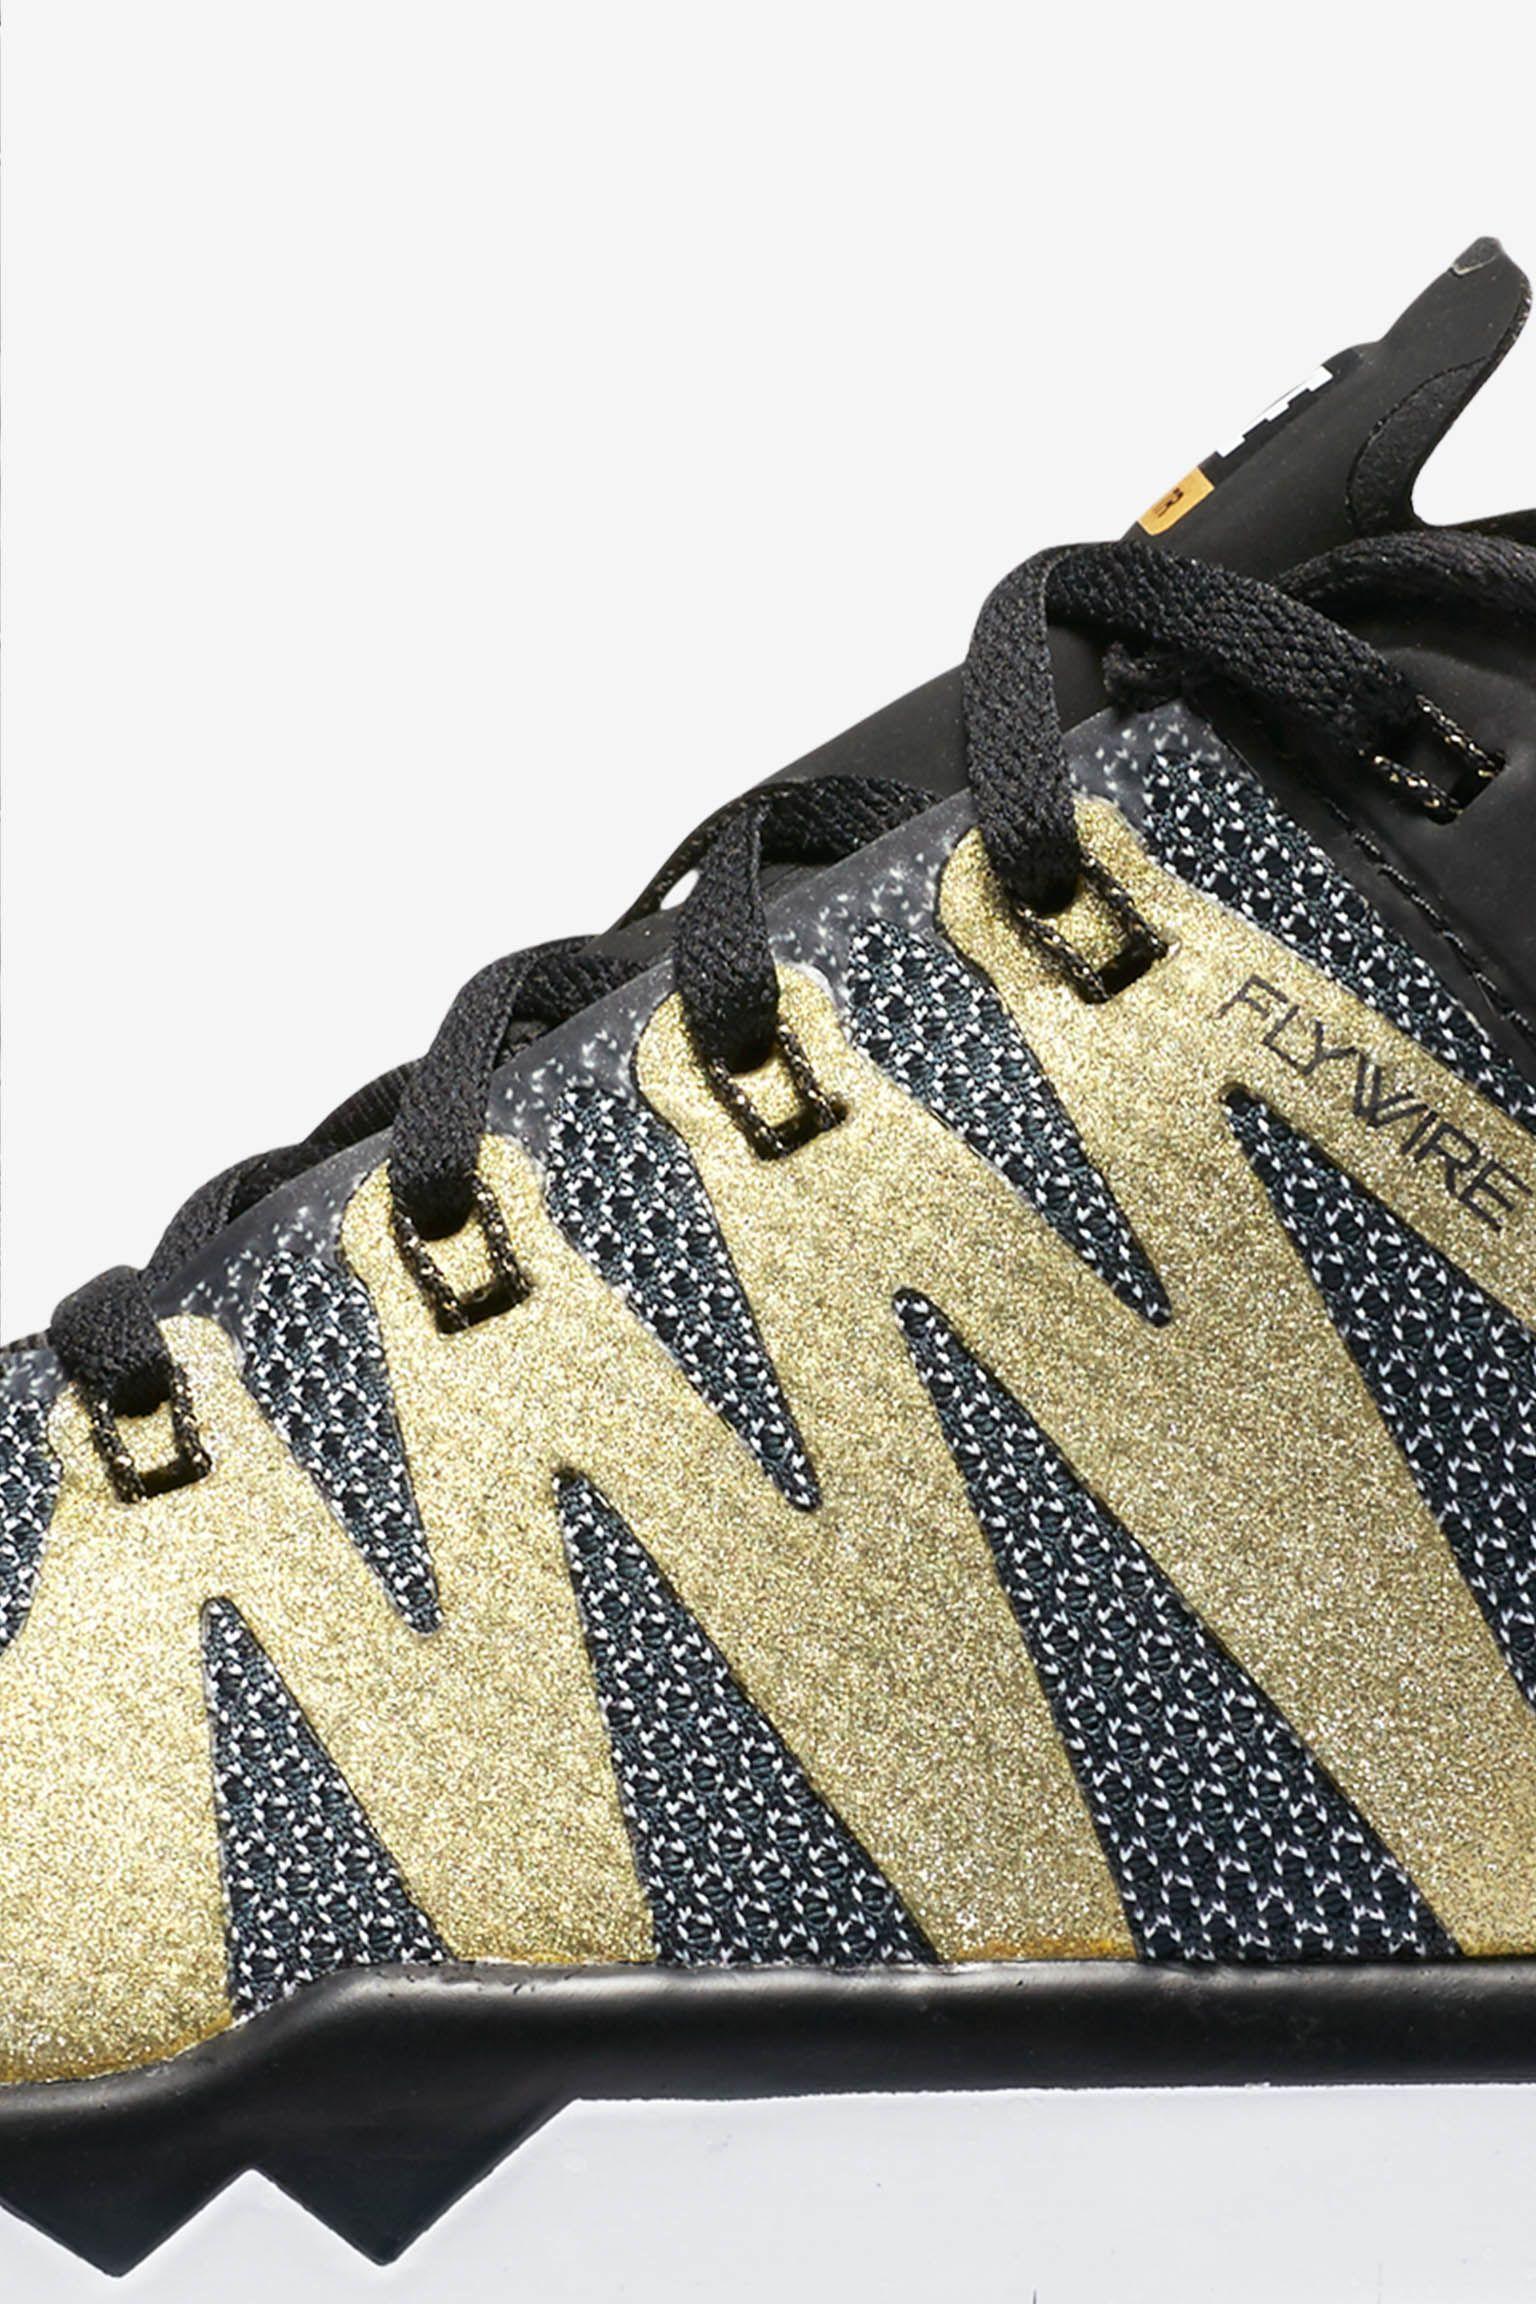 Nike SB50 Nike Free Trainer 5.0 V6 'Black & Metallic Gold'